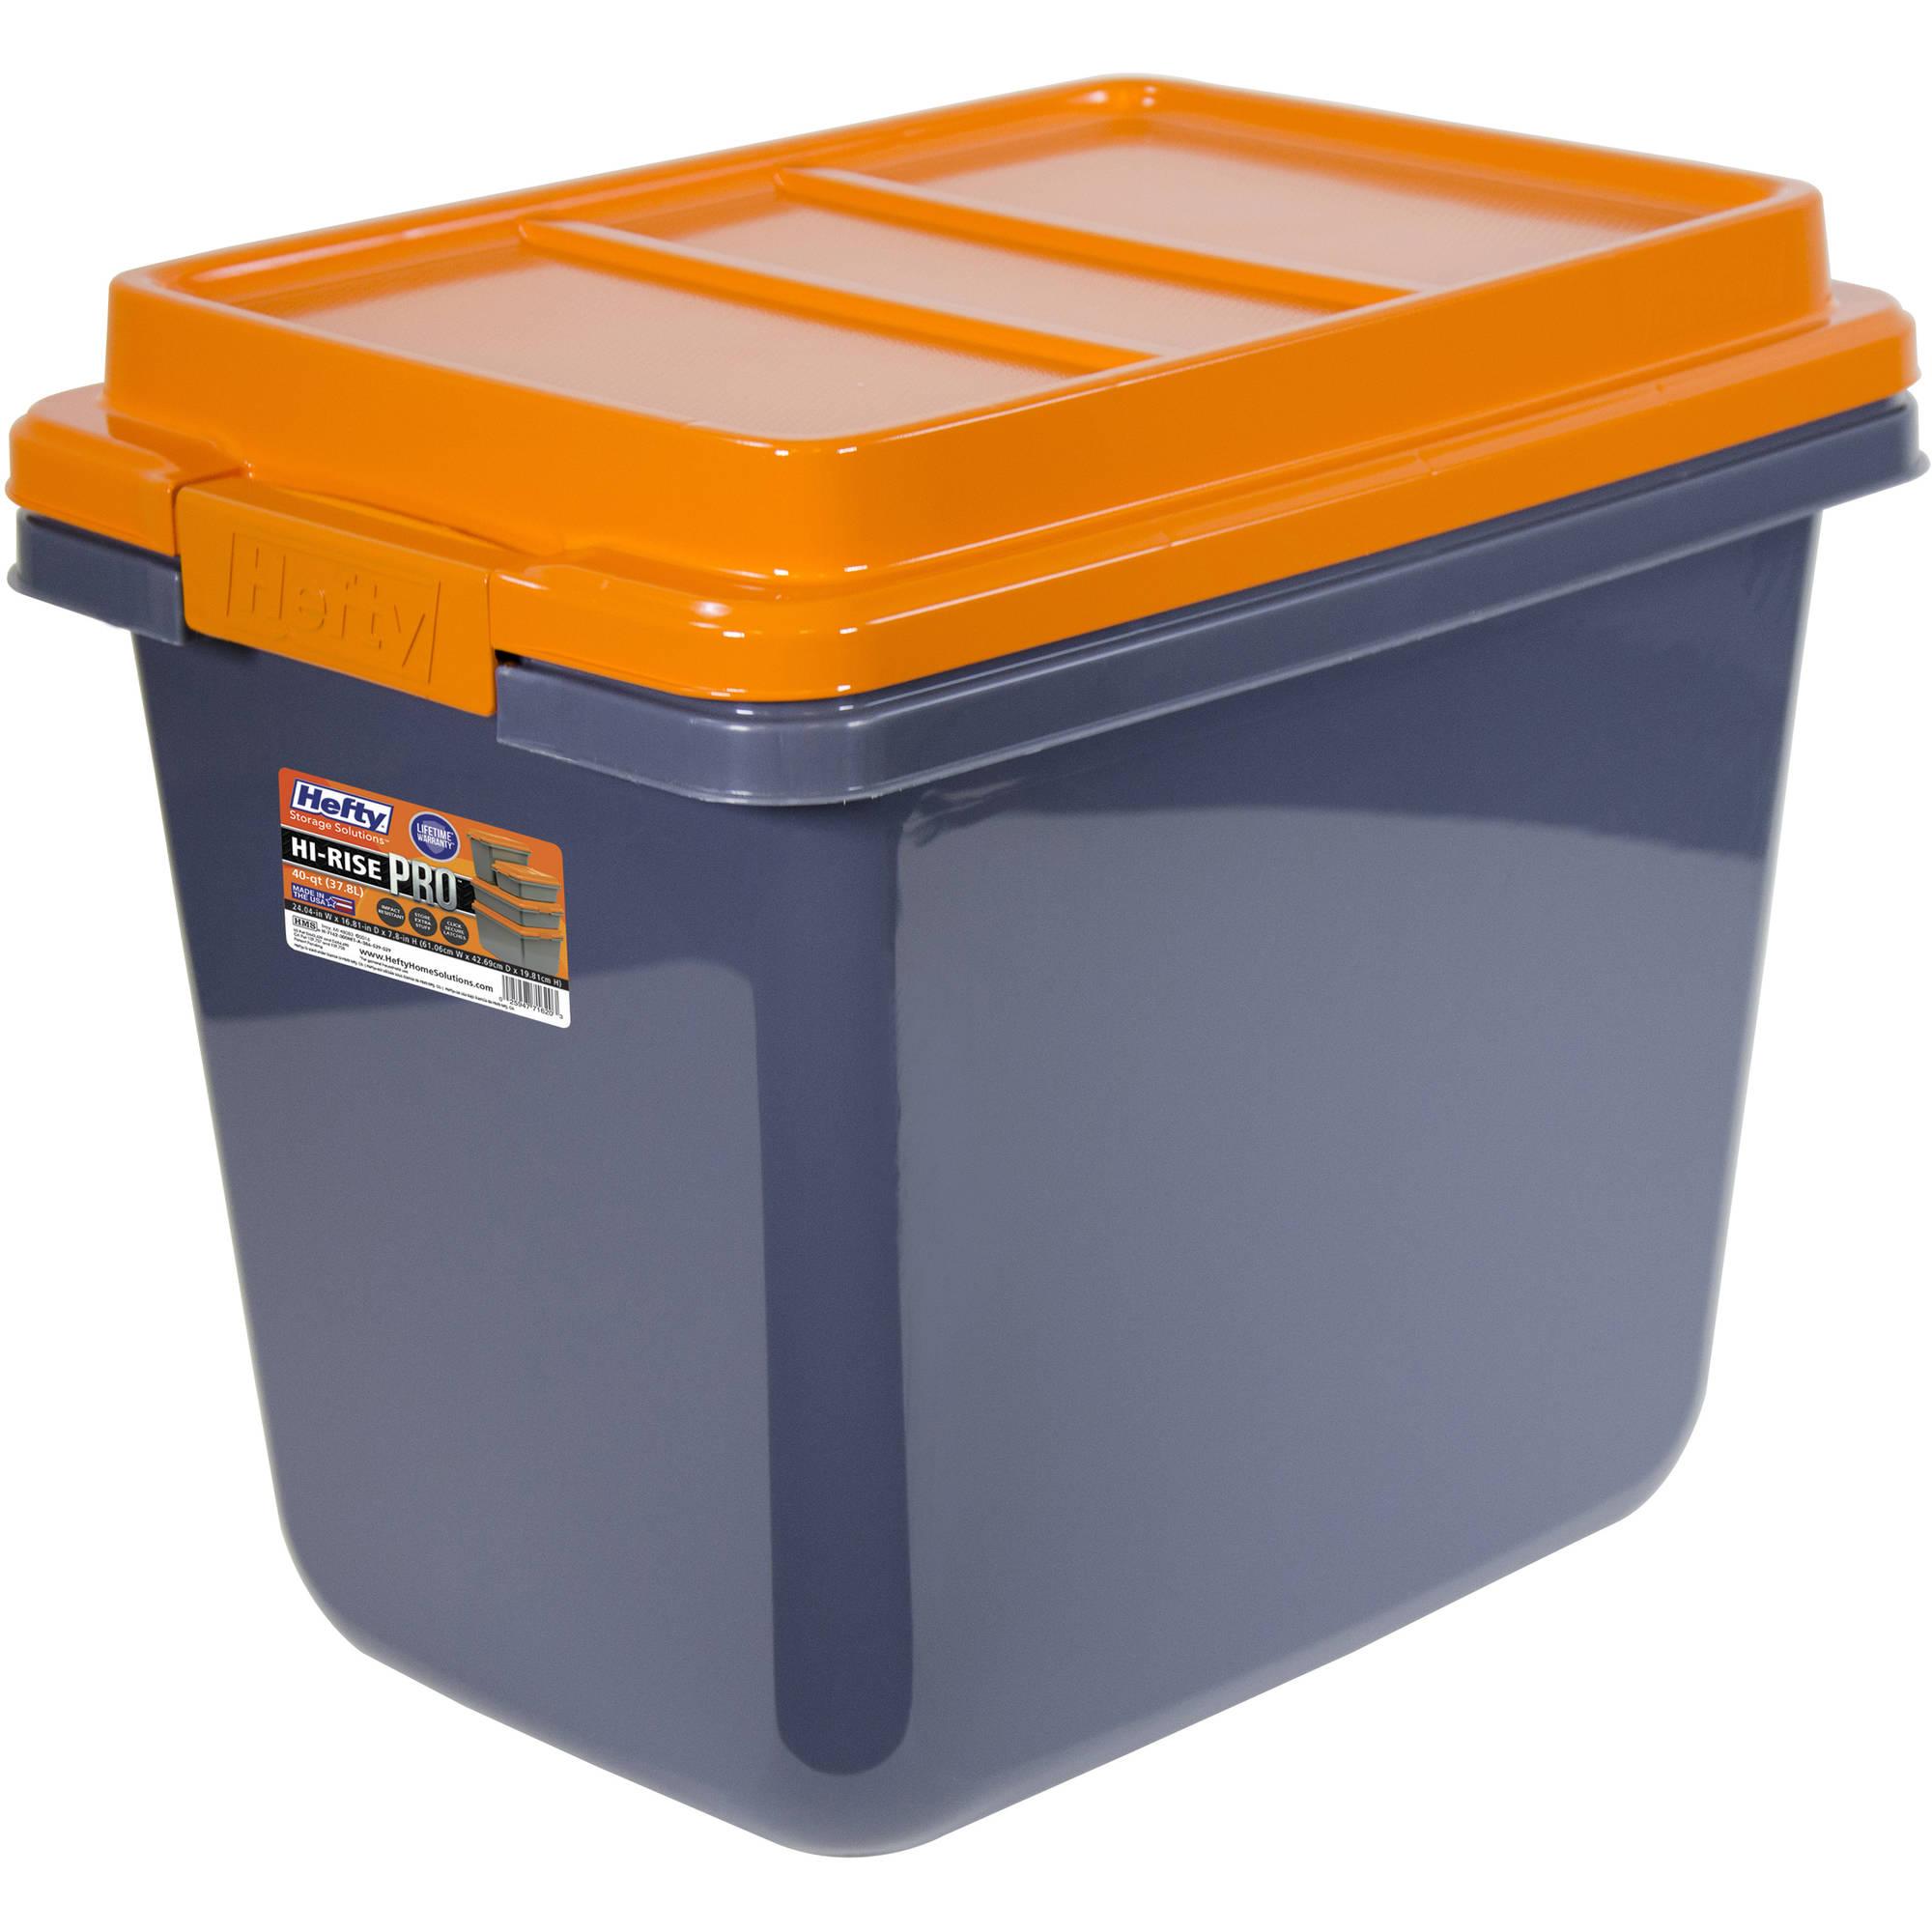 Hefty HI-RISE Heavy Duty Storage Bins, 32 Qt. Latch Storage Box, Orange/Gray